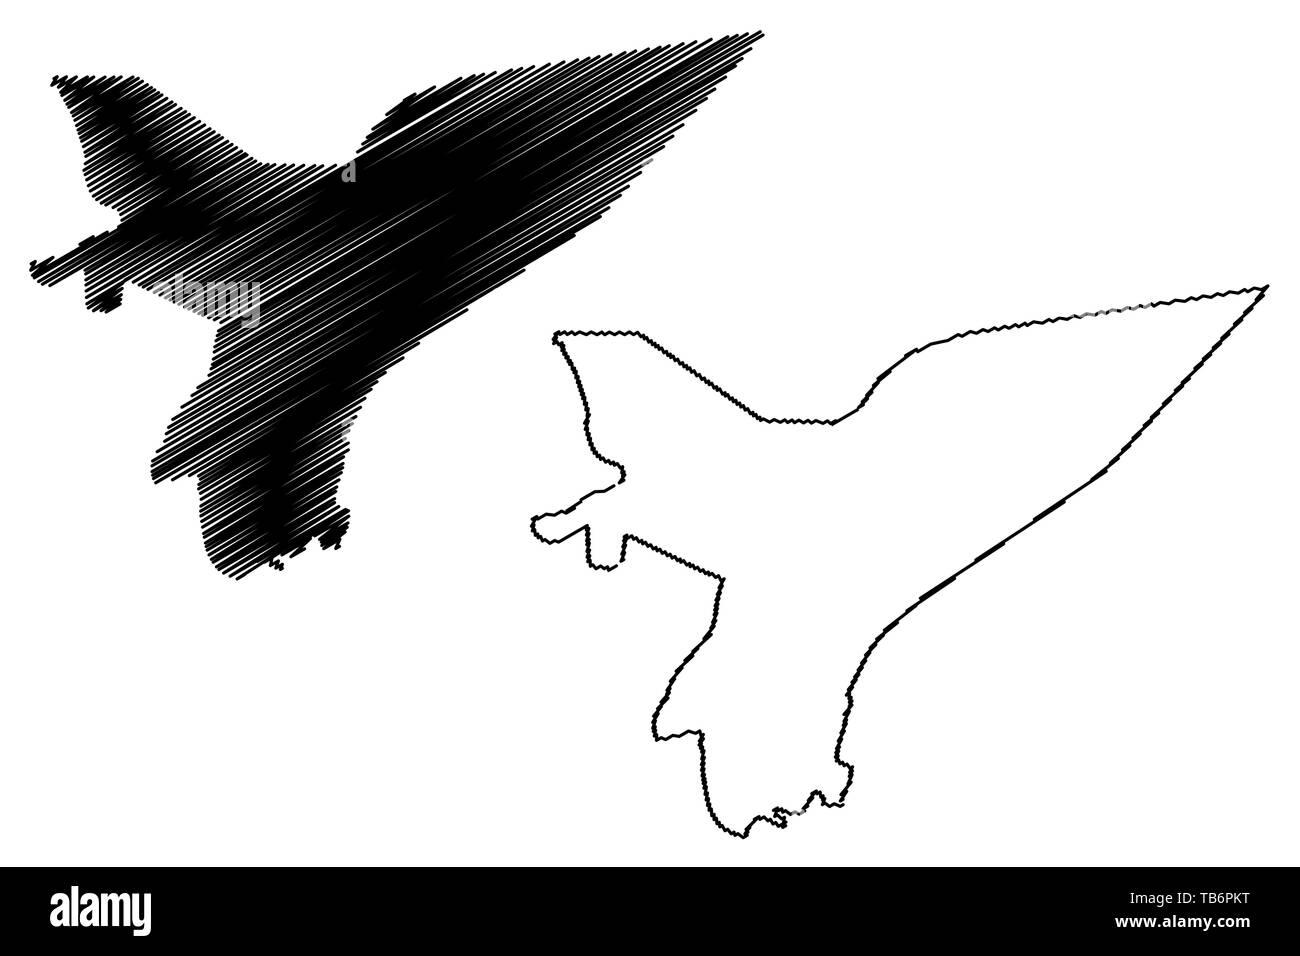 Marib Governorate (Governorates of Yemen, Republic of Yemen) map vector illustration, scribble sketch Ma'rib map - Stock Vector